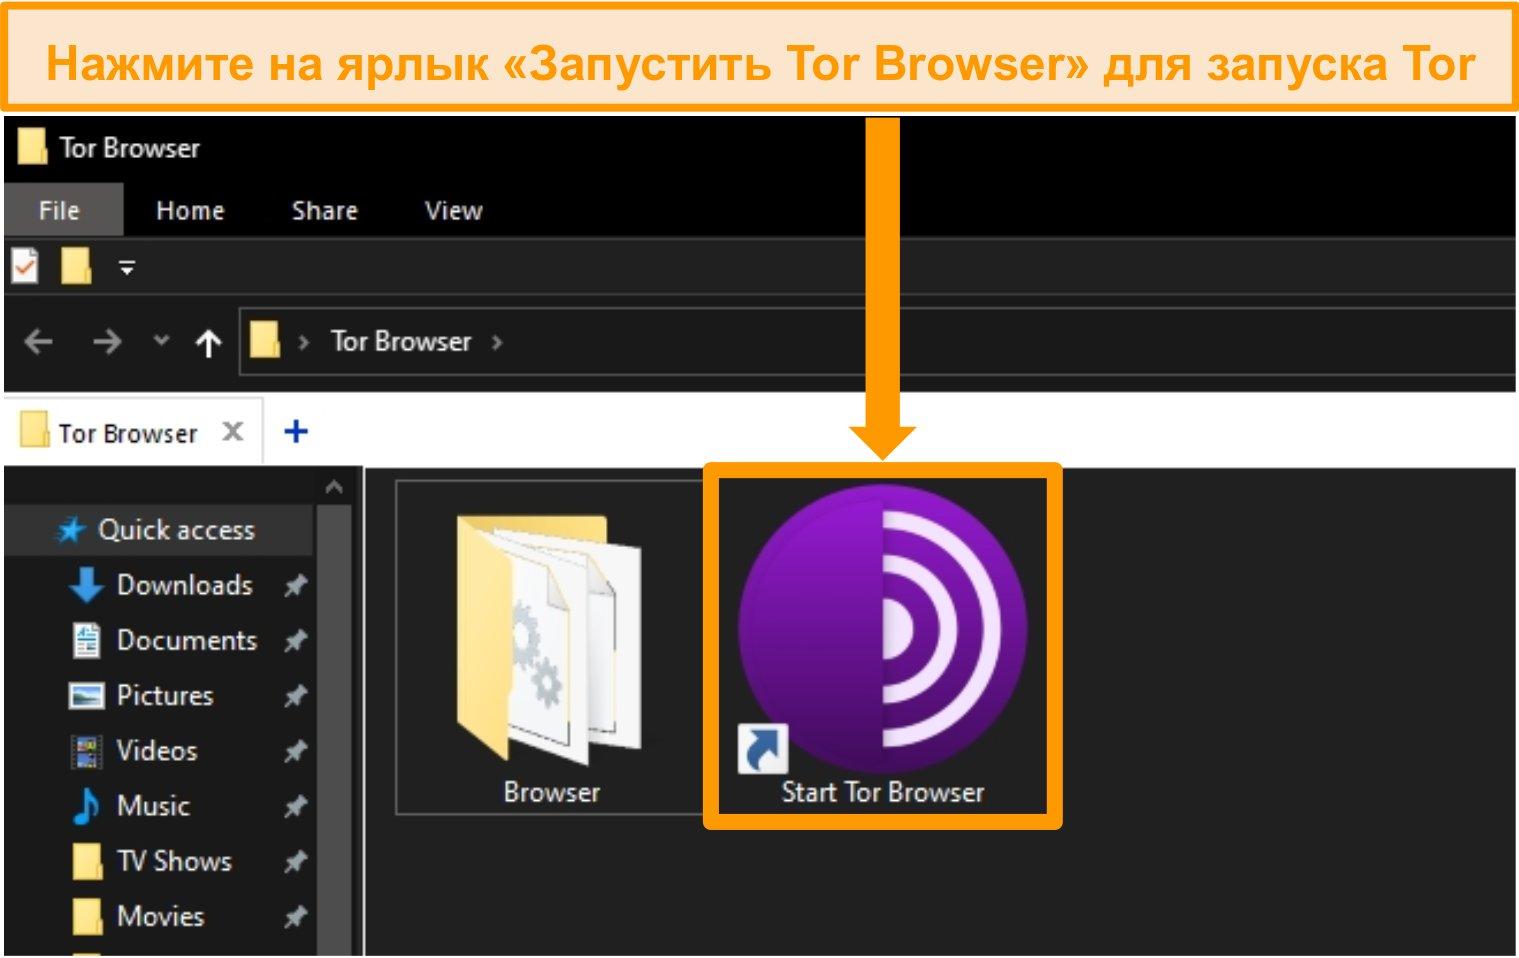 Снимок экрана установки браузера Tor в Windows